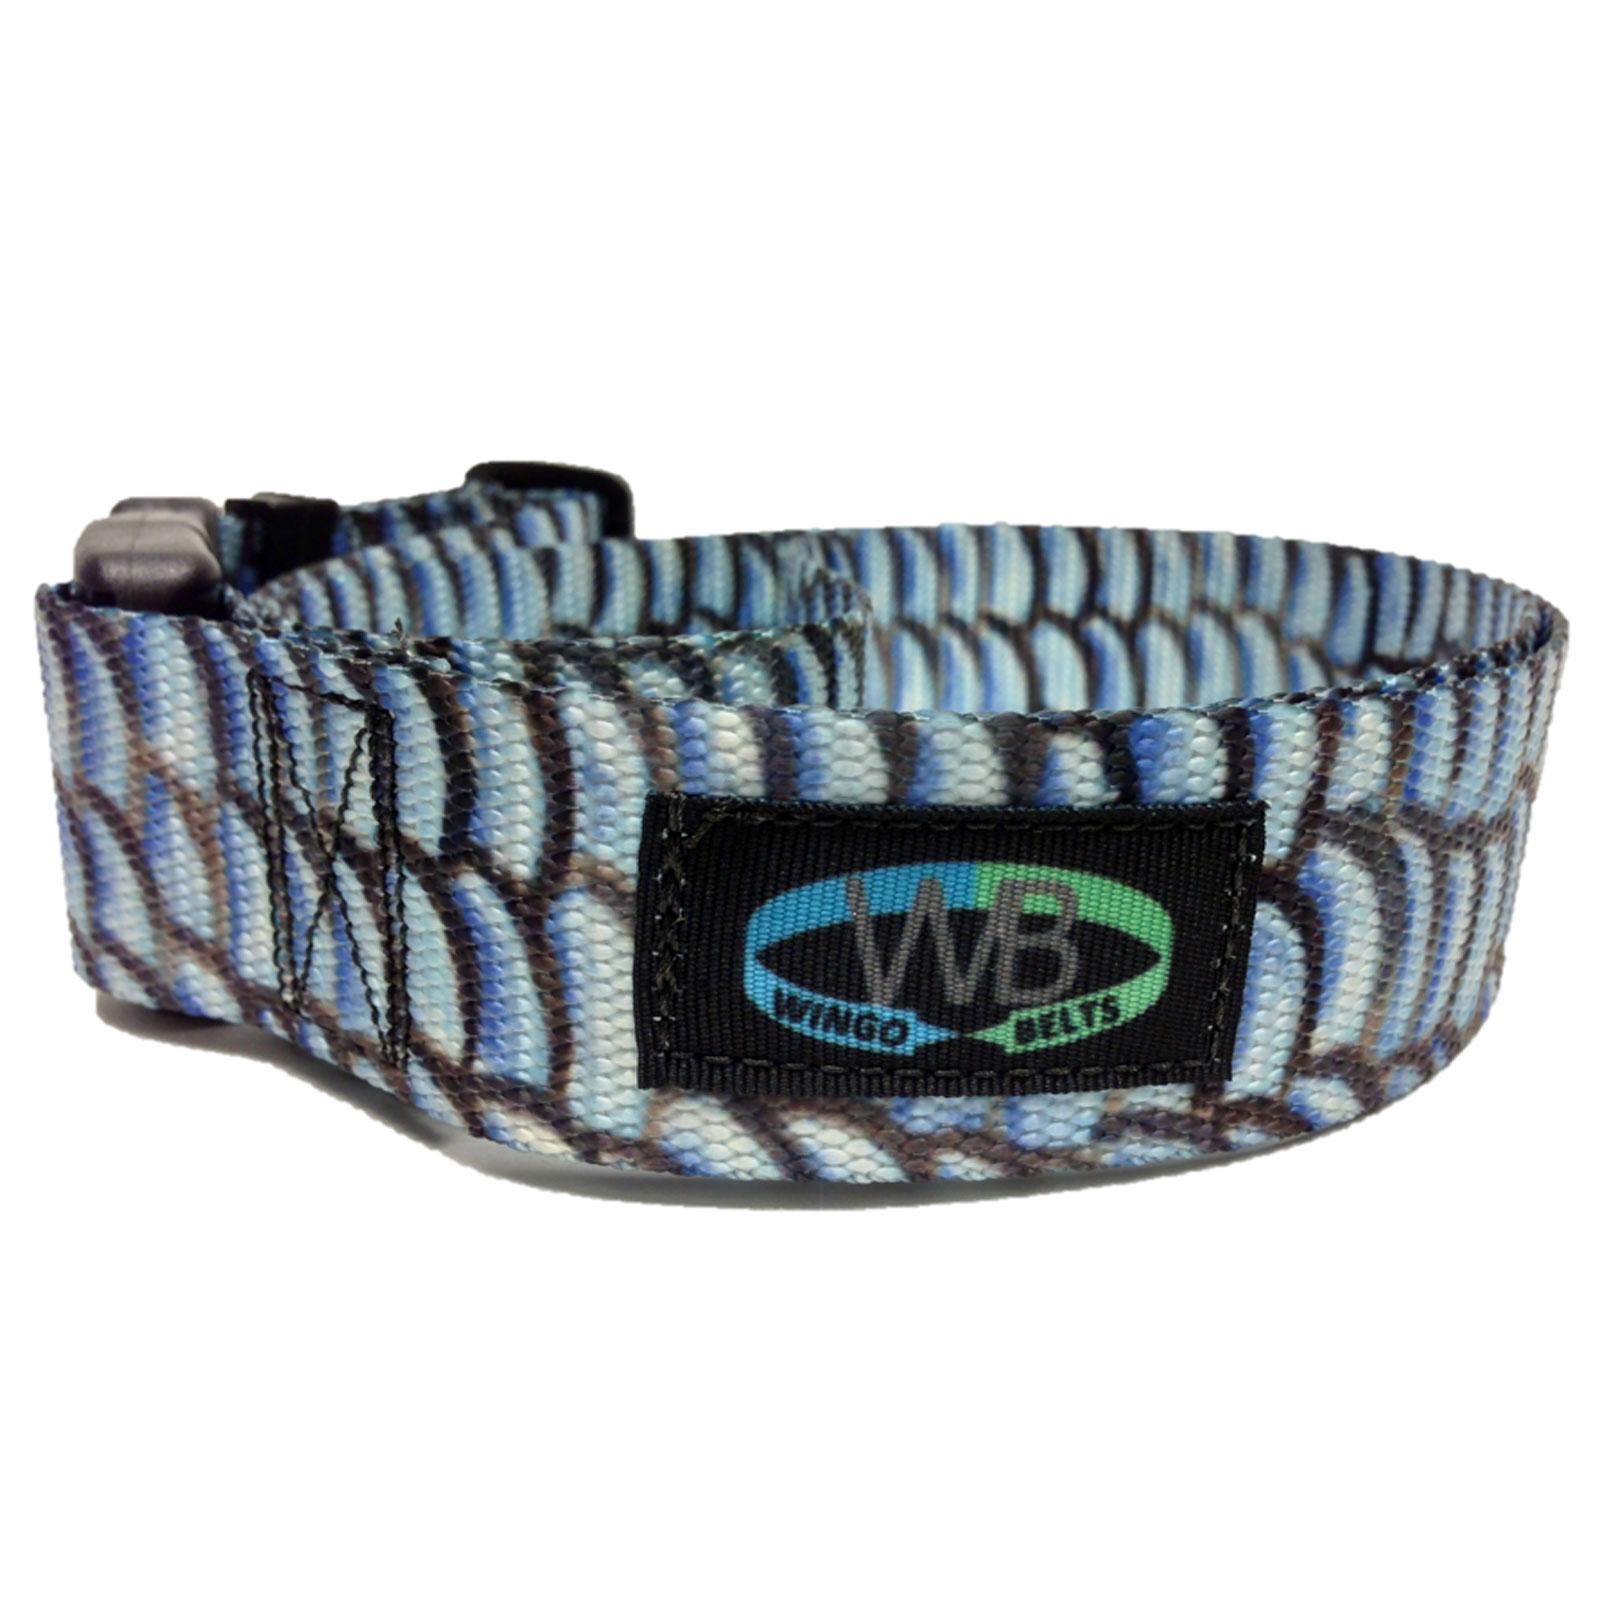 Wingo belts wading belts artisan durable adjustable for Wade fishing belt